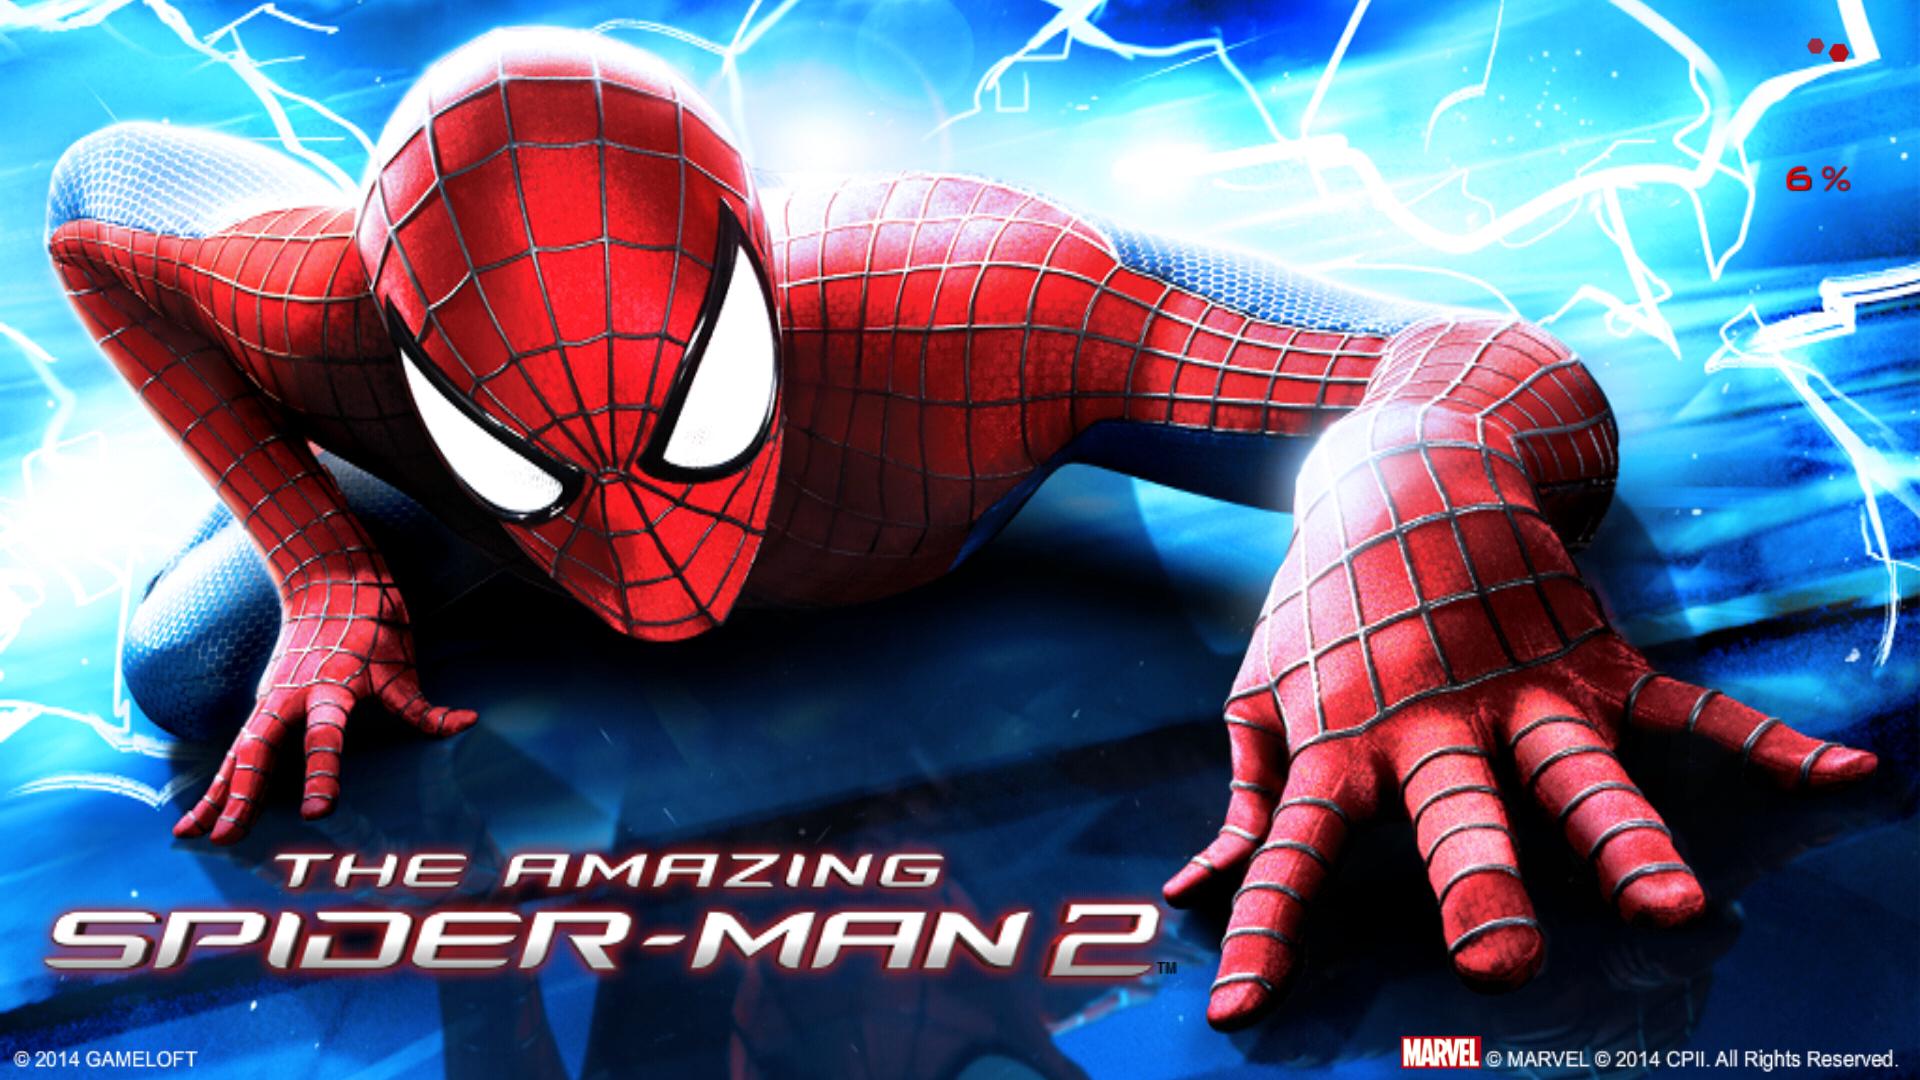 The Amazing Spiderman 2 Hack Cheat Unlimited Spider Points Health Energy Skills Suits Unlocker Http Android Inanilmaz Orumcek Adam Orumcek Adam Oyunlar